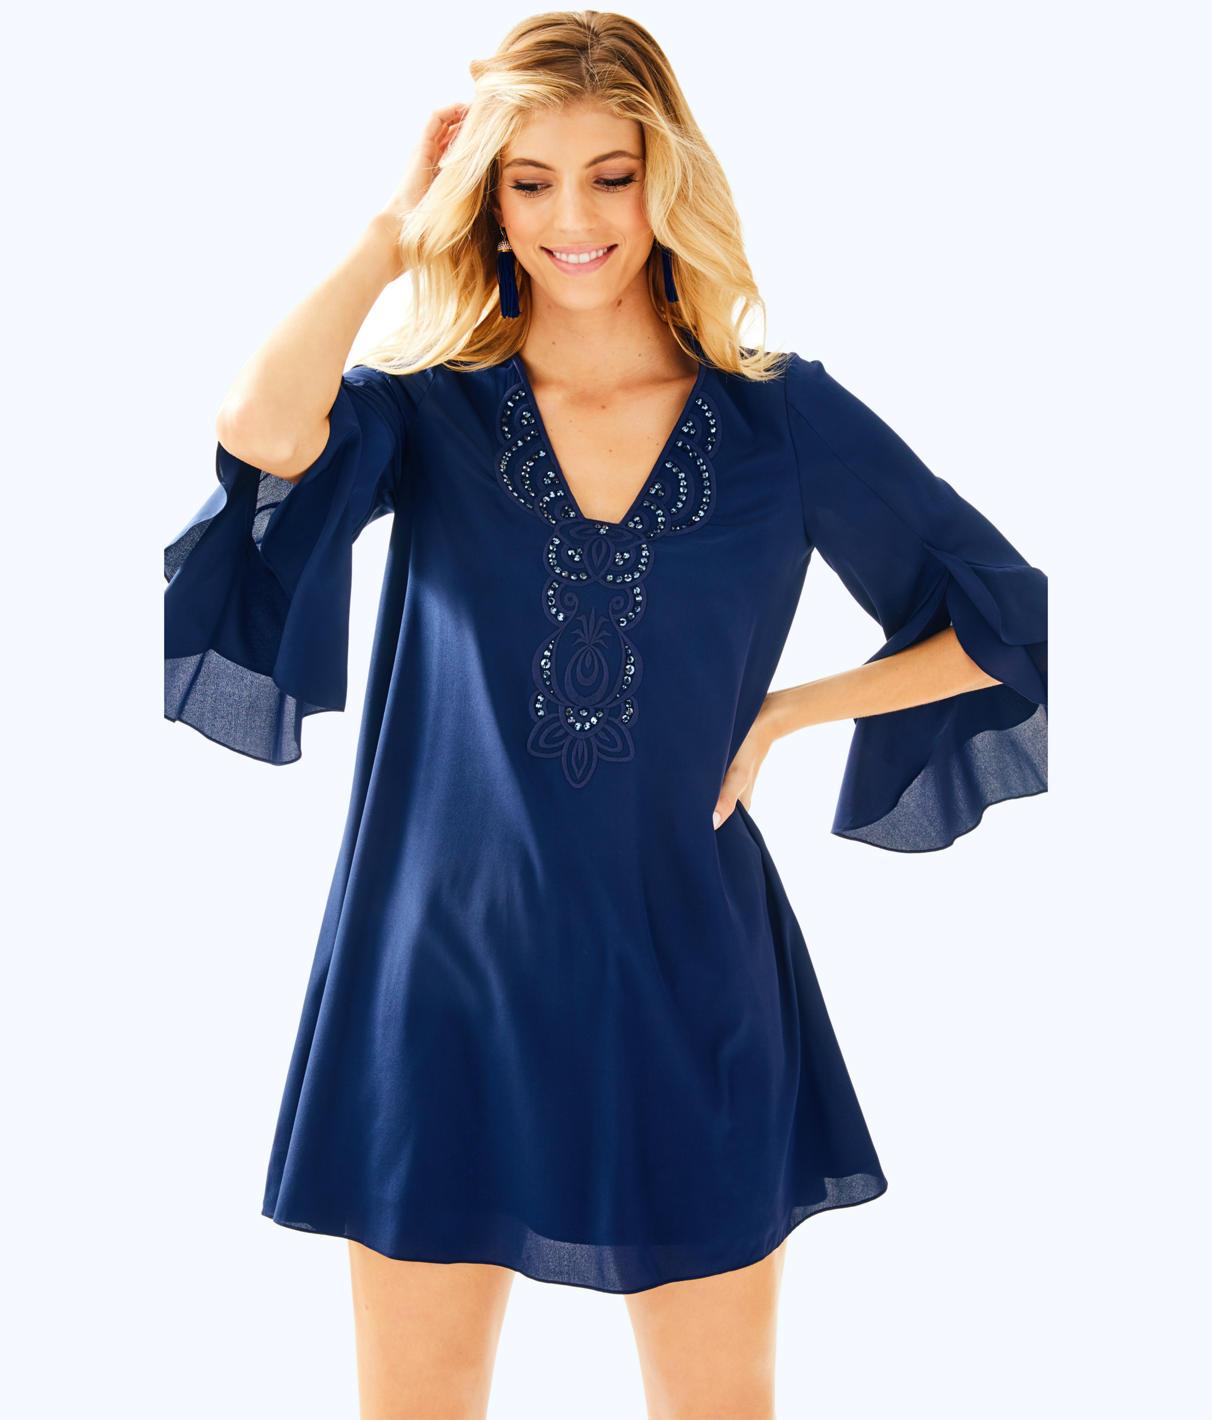 Lilly Pulitzer Lilly Pulitzer Womens Tatiana Stretch Silk Tunic Dress